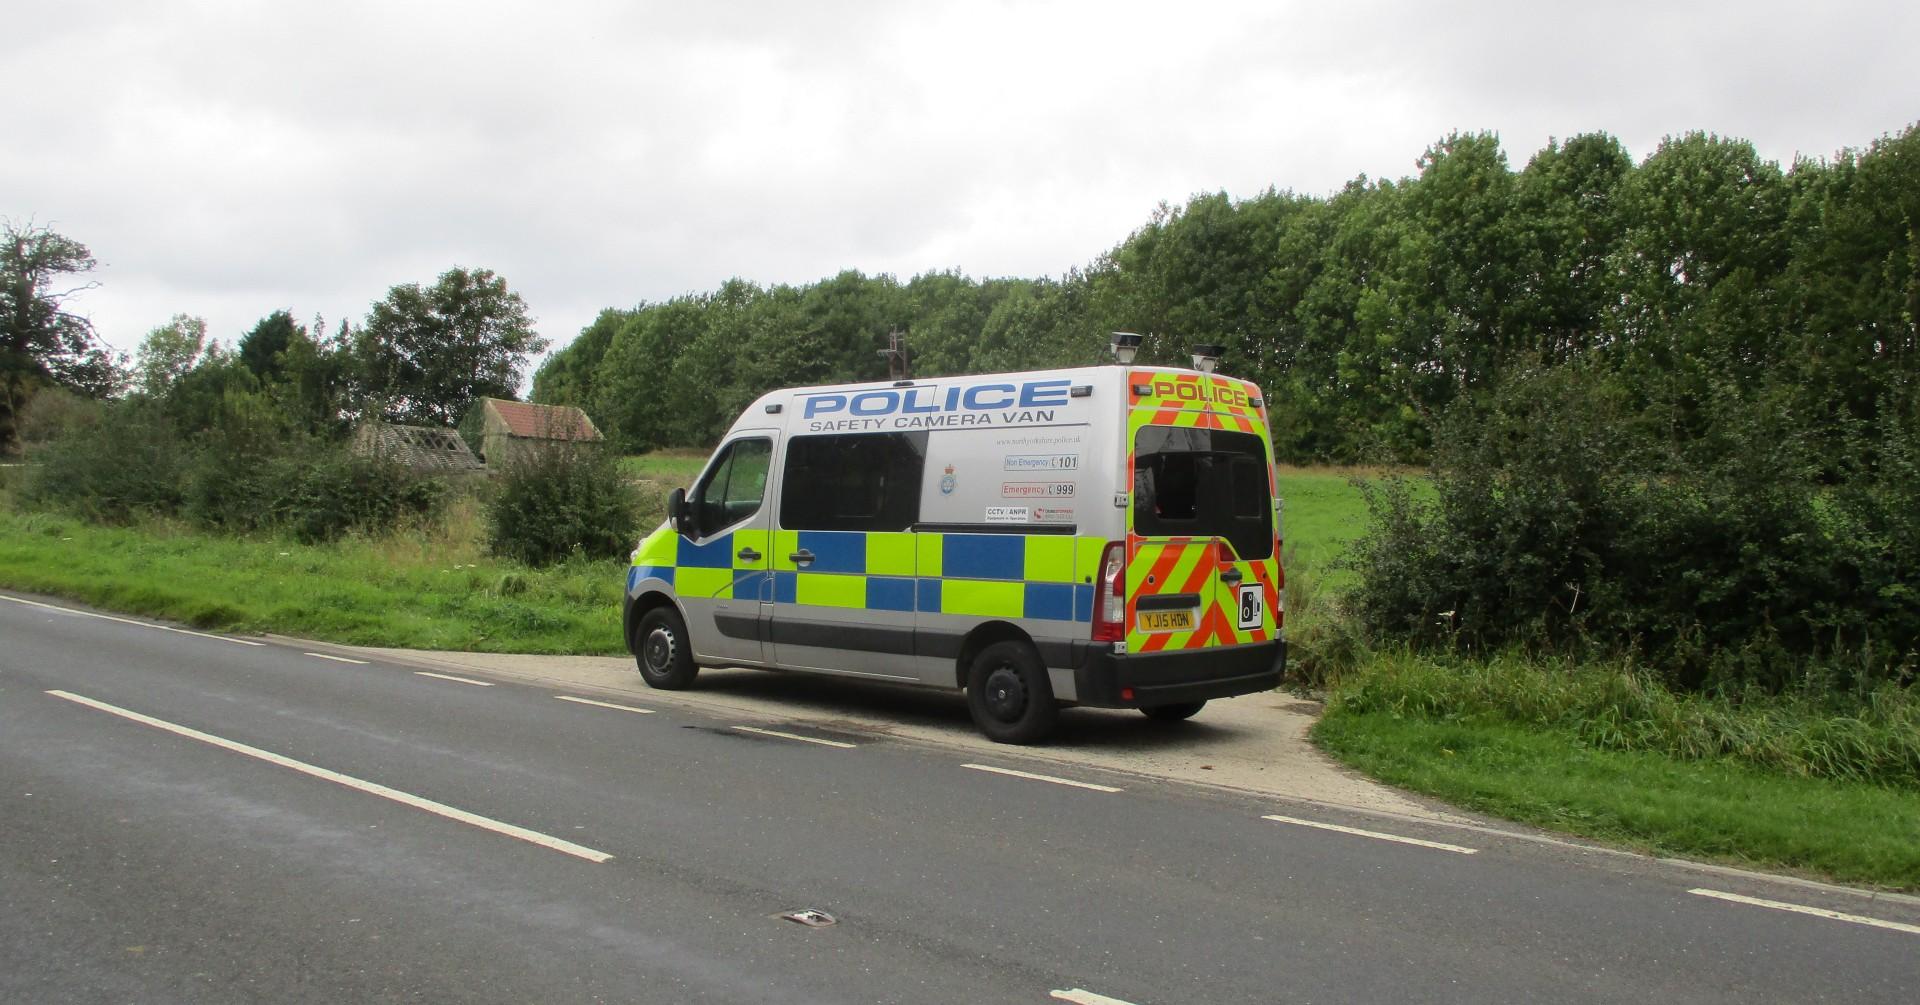 A North Yorkshire Police speed van